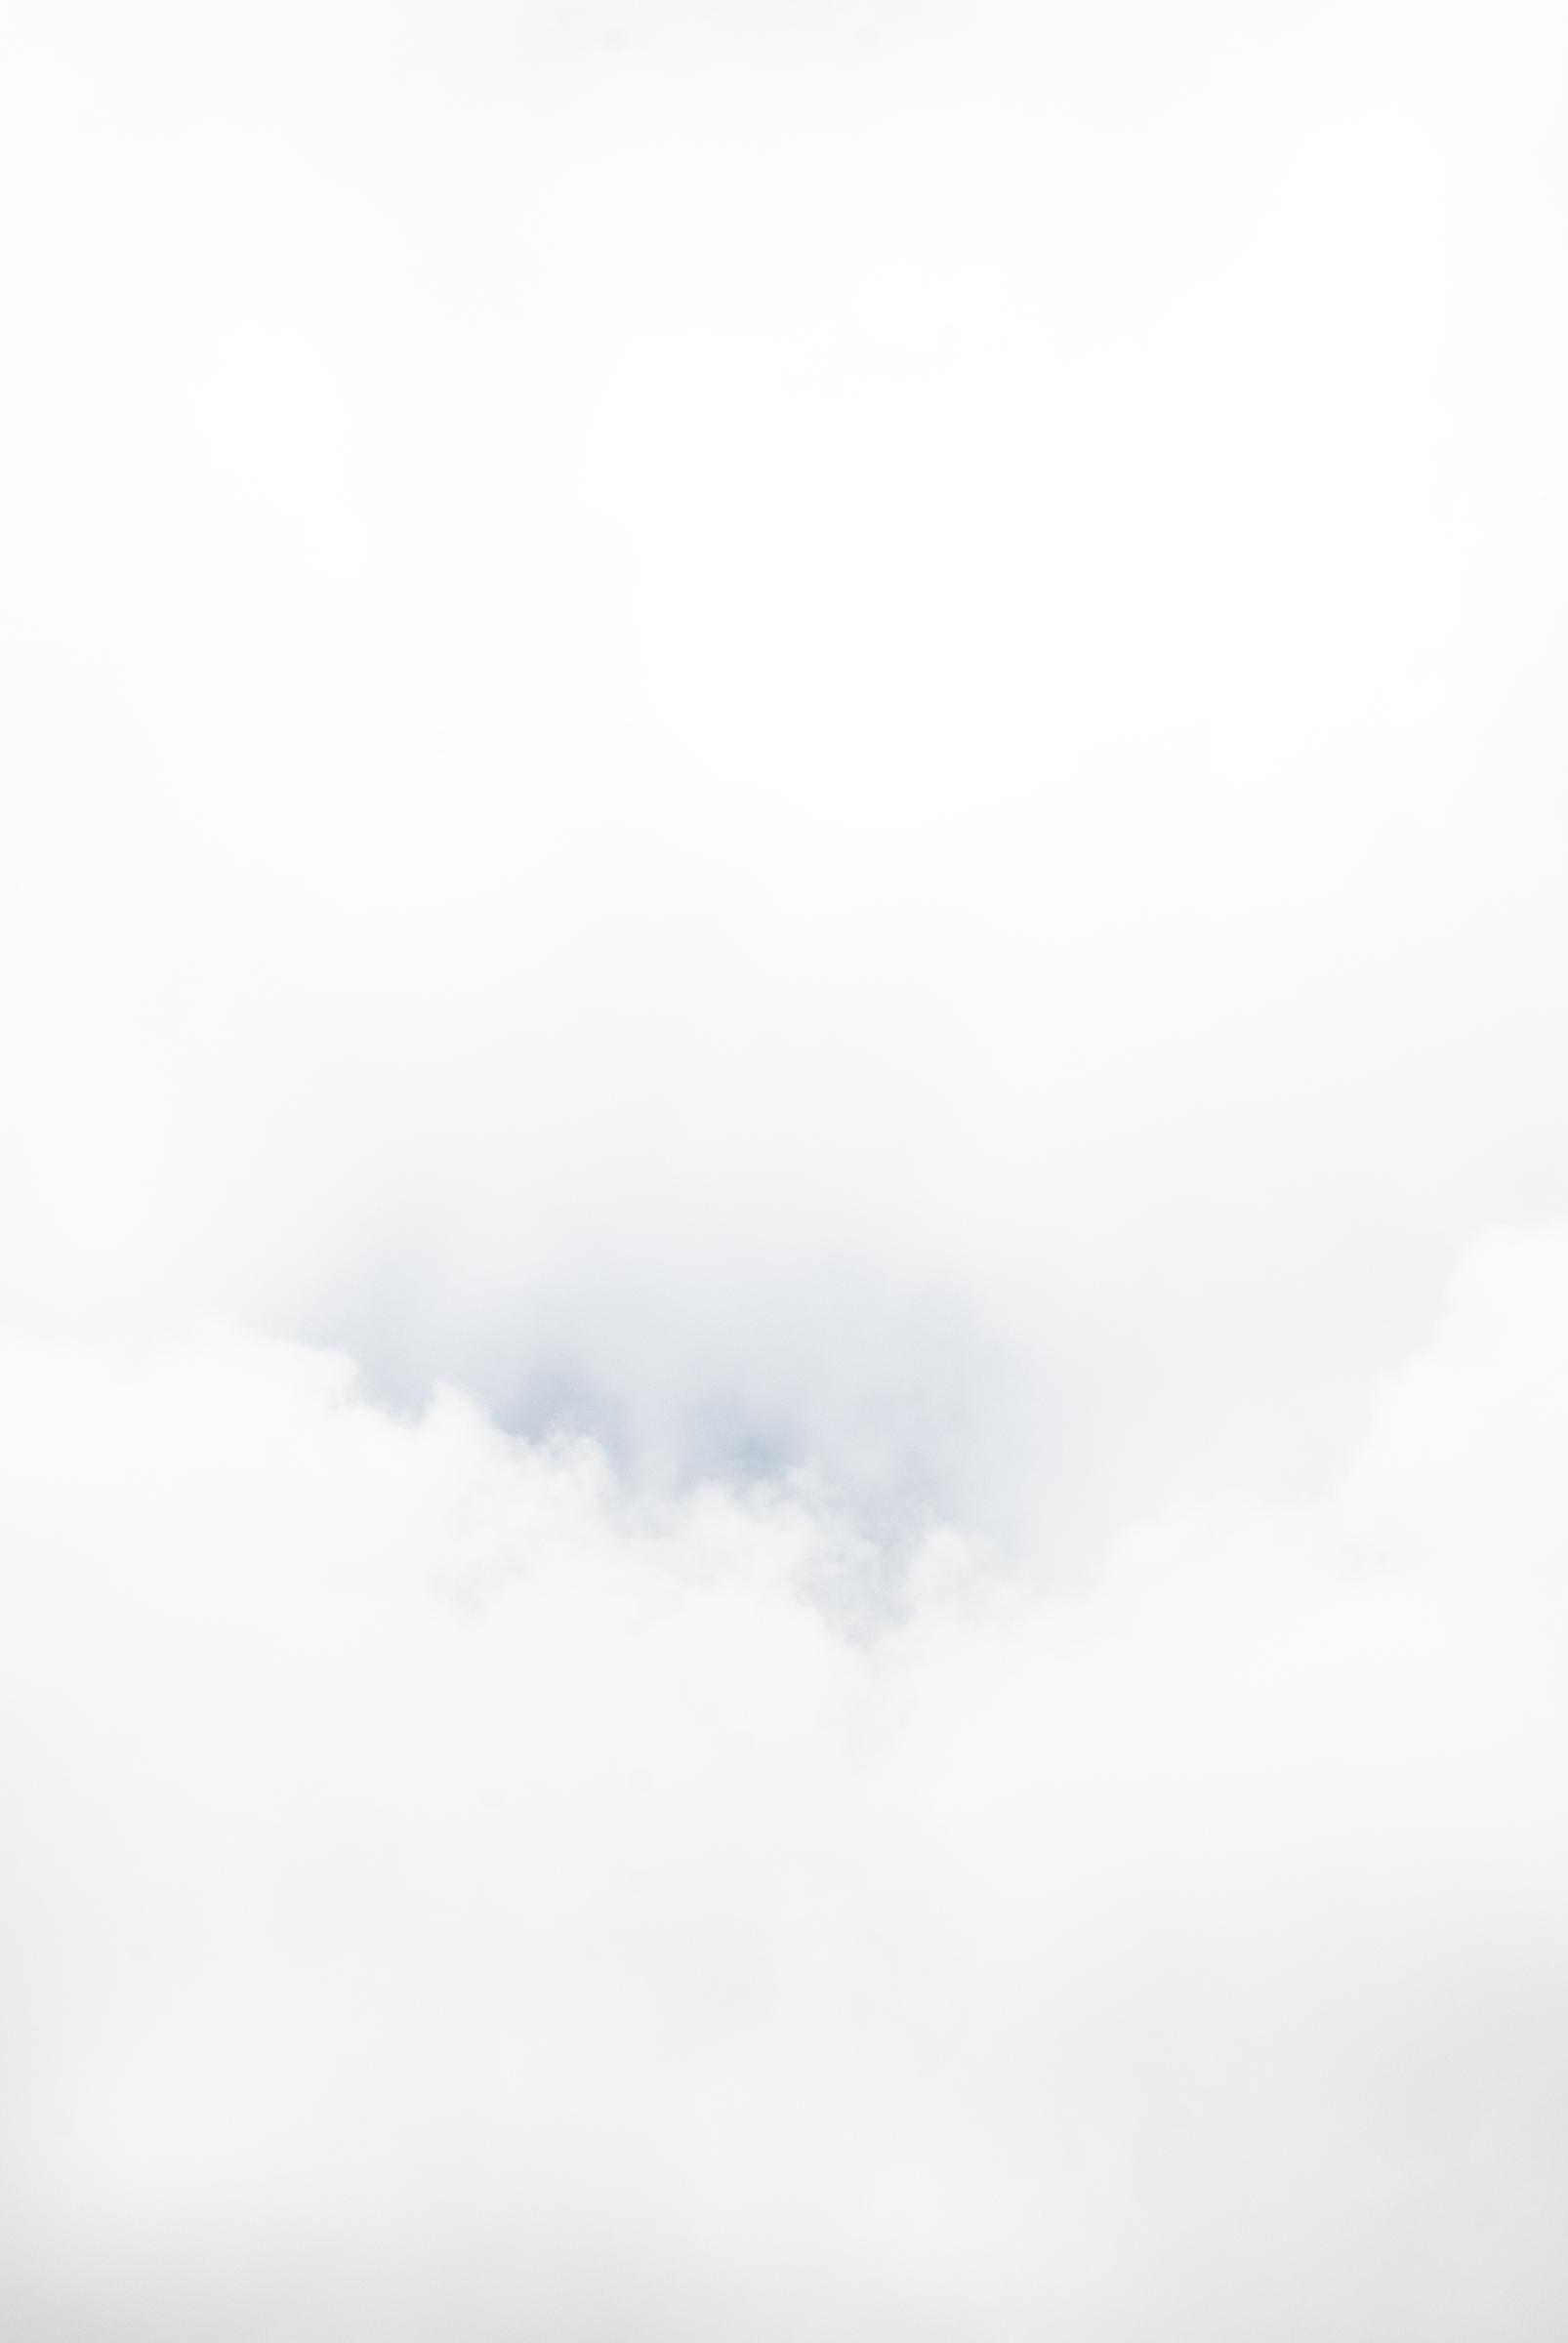 bball_clouds_2_20100605_0106.jpg